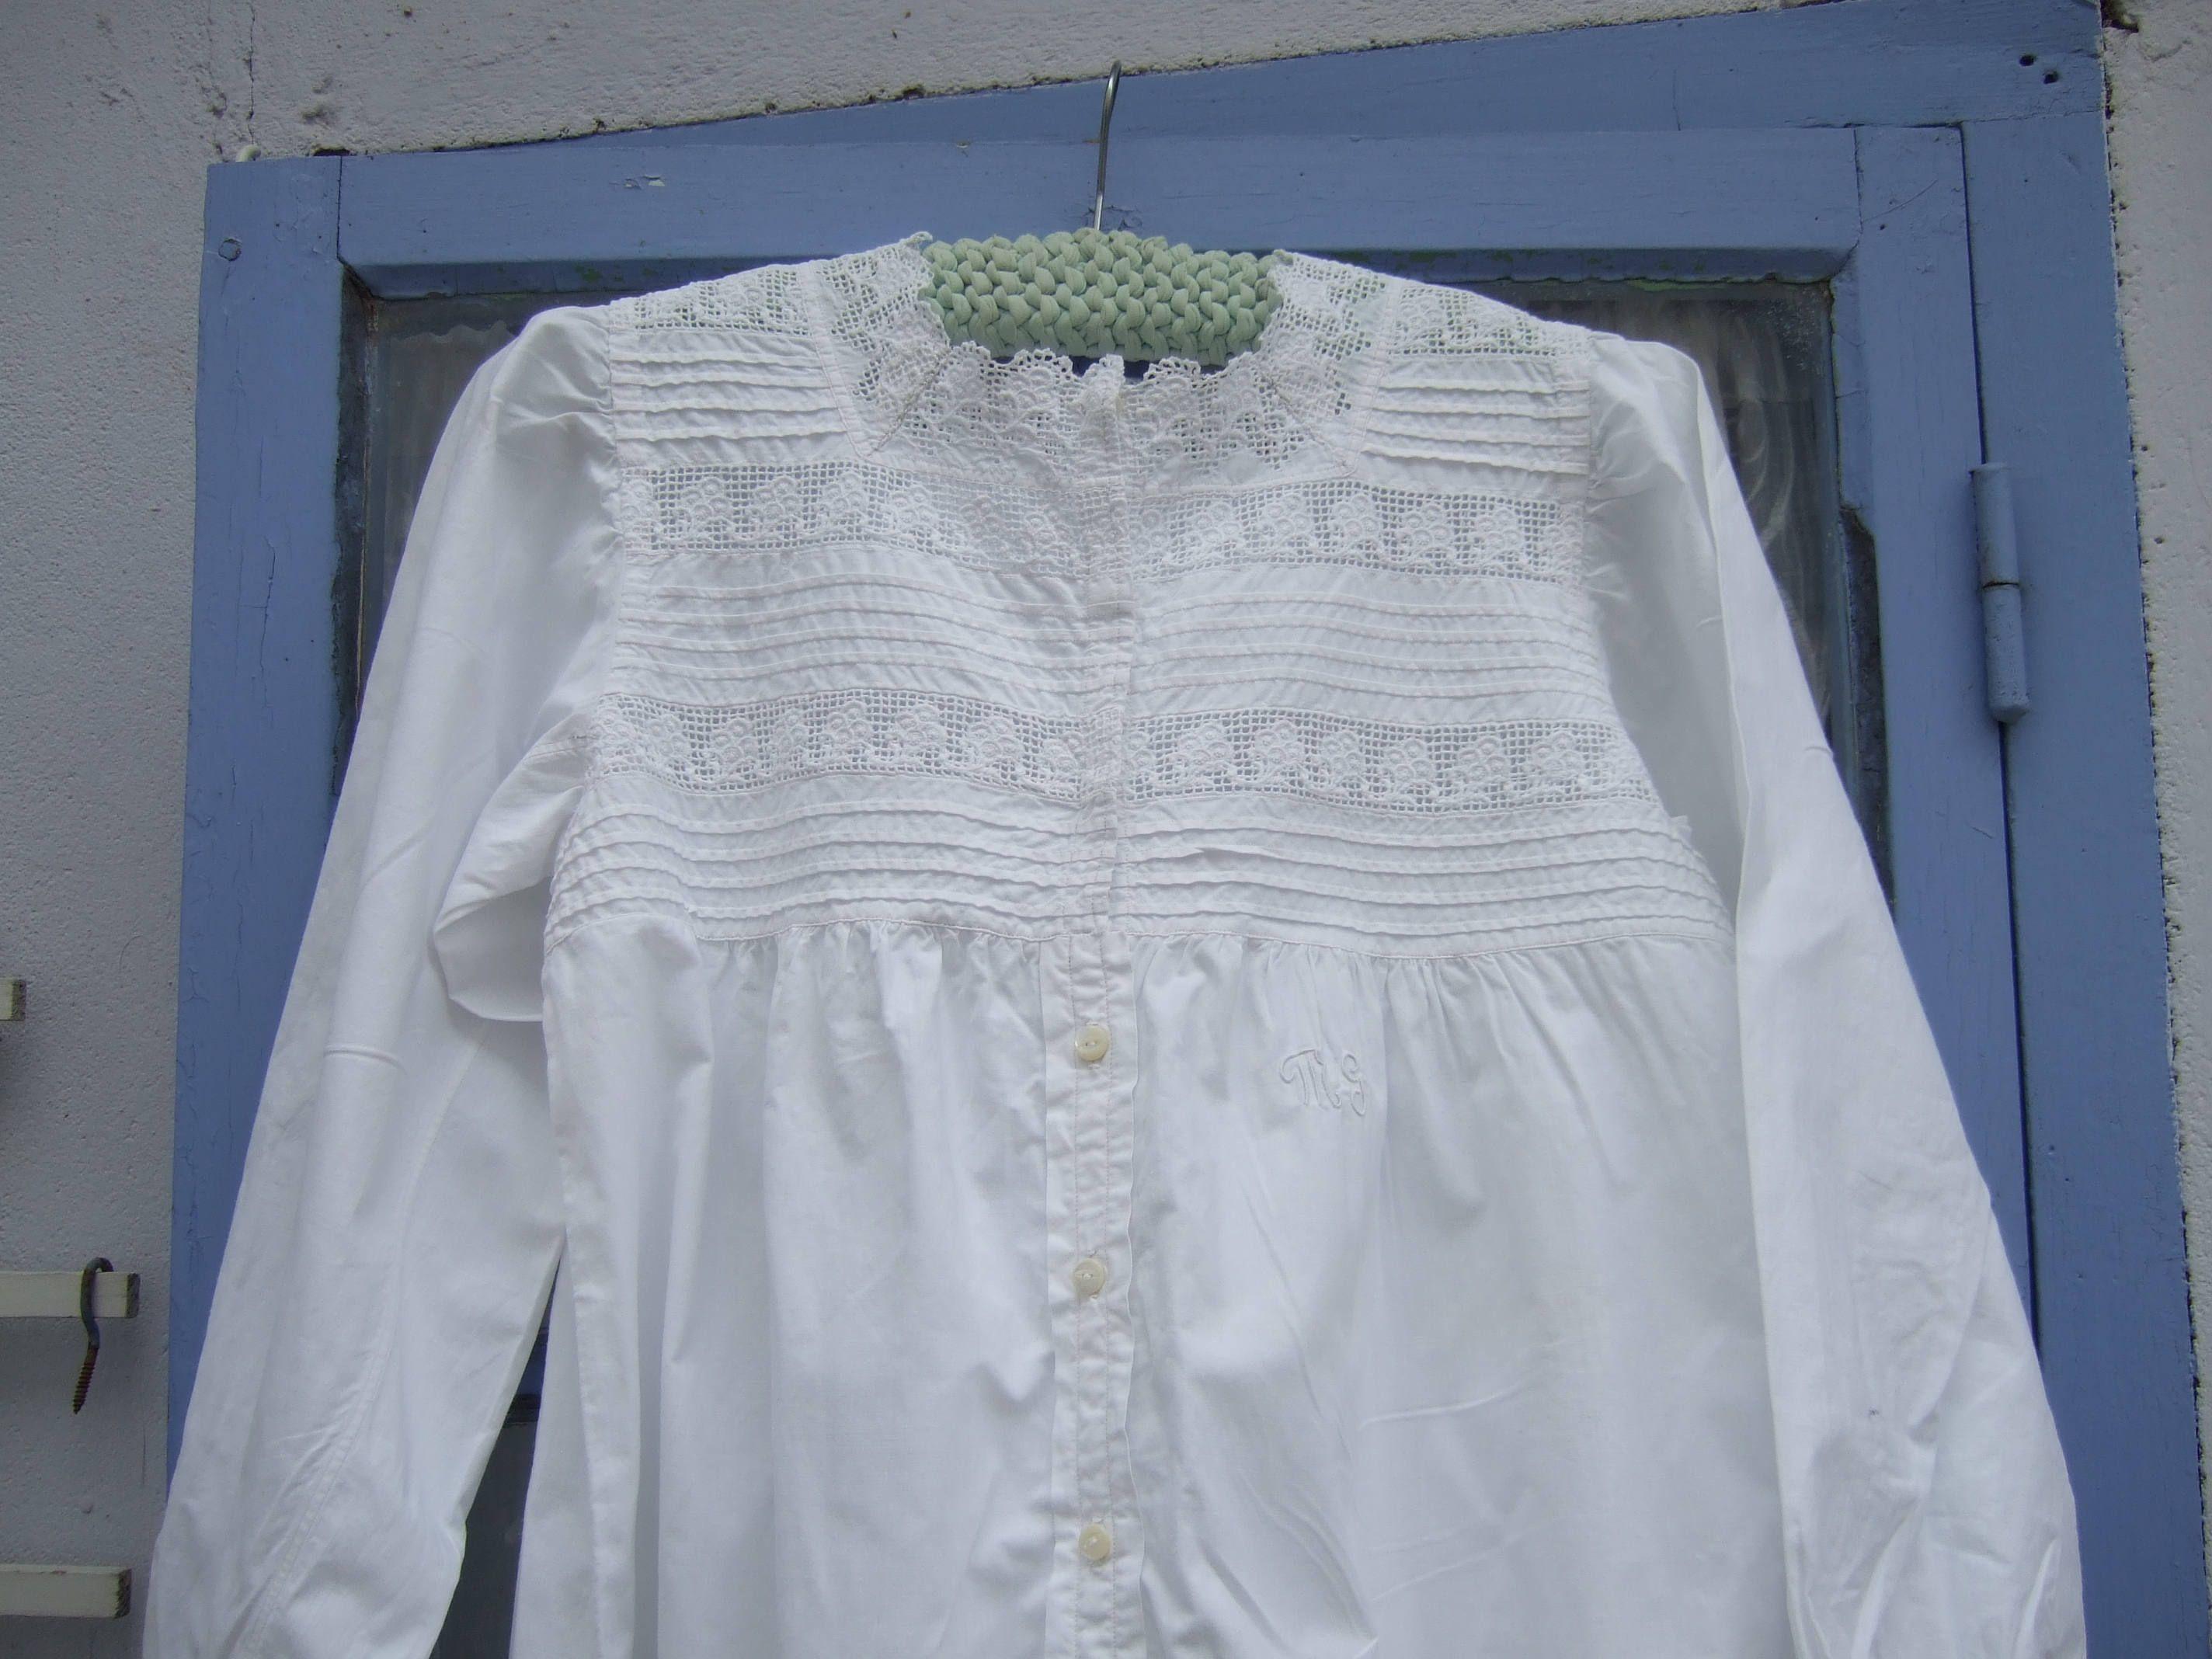 Antique French Fine Linen Nightdress. Handmade. Monogram MG. Young Ladies.night dress.